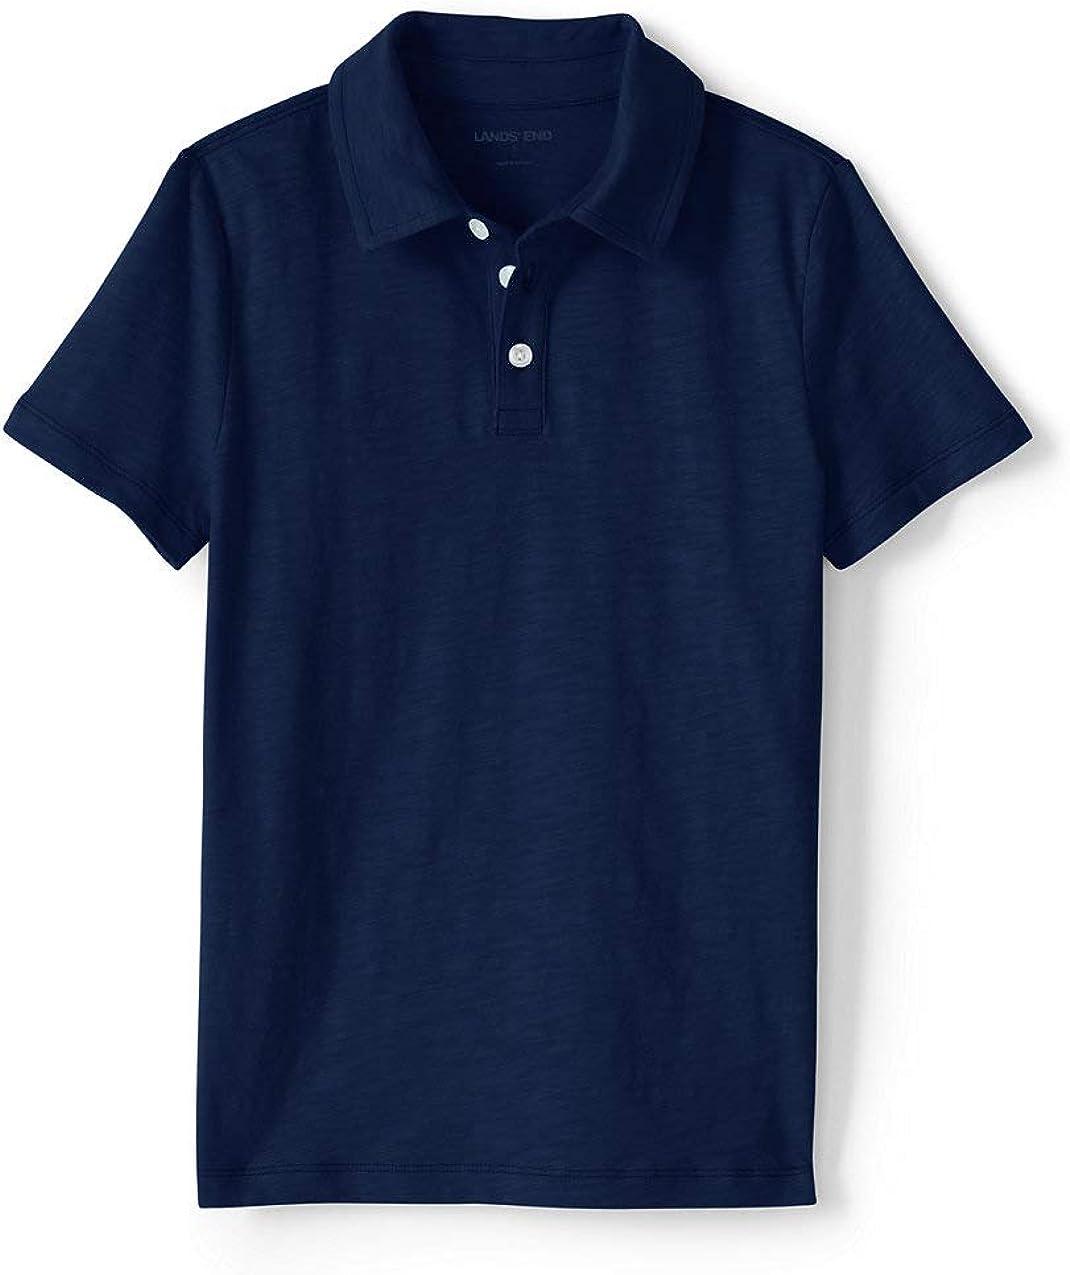 Lands' End Little Boys Solid Slub Polo Shirt